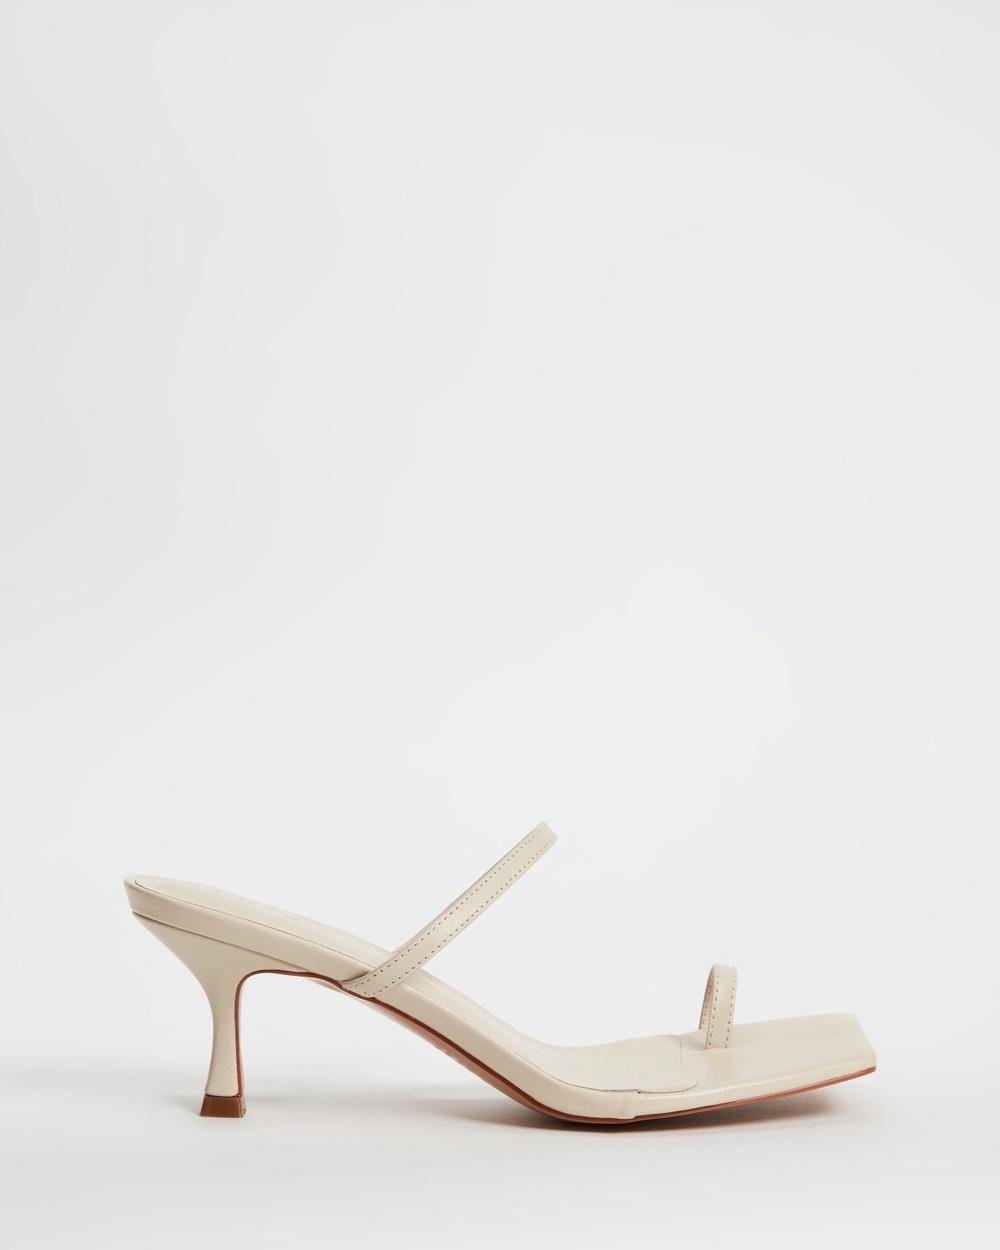 Alias Mae Baker Sandals Bone Leather